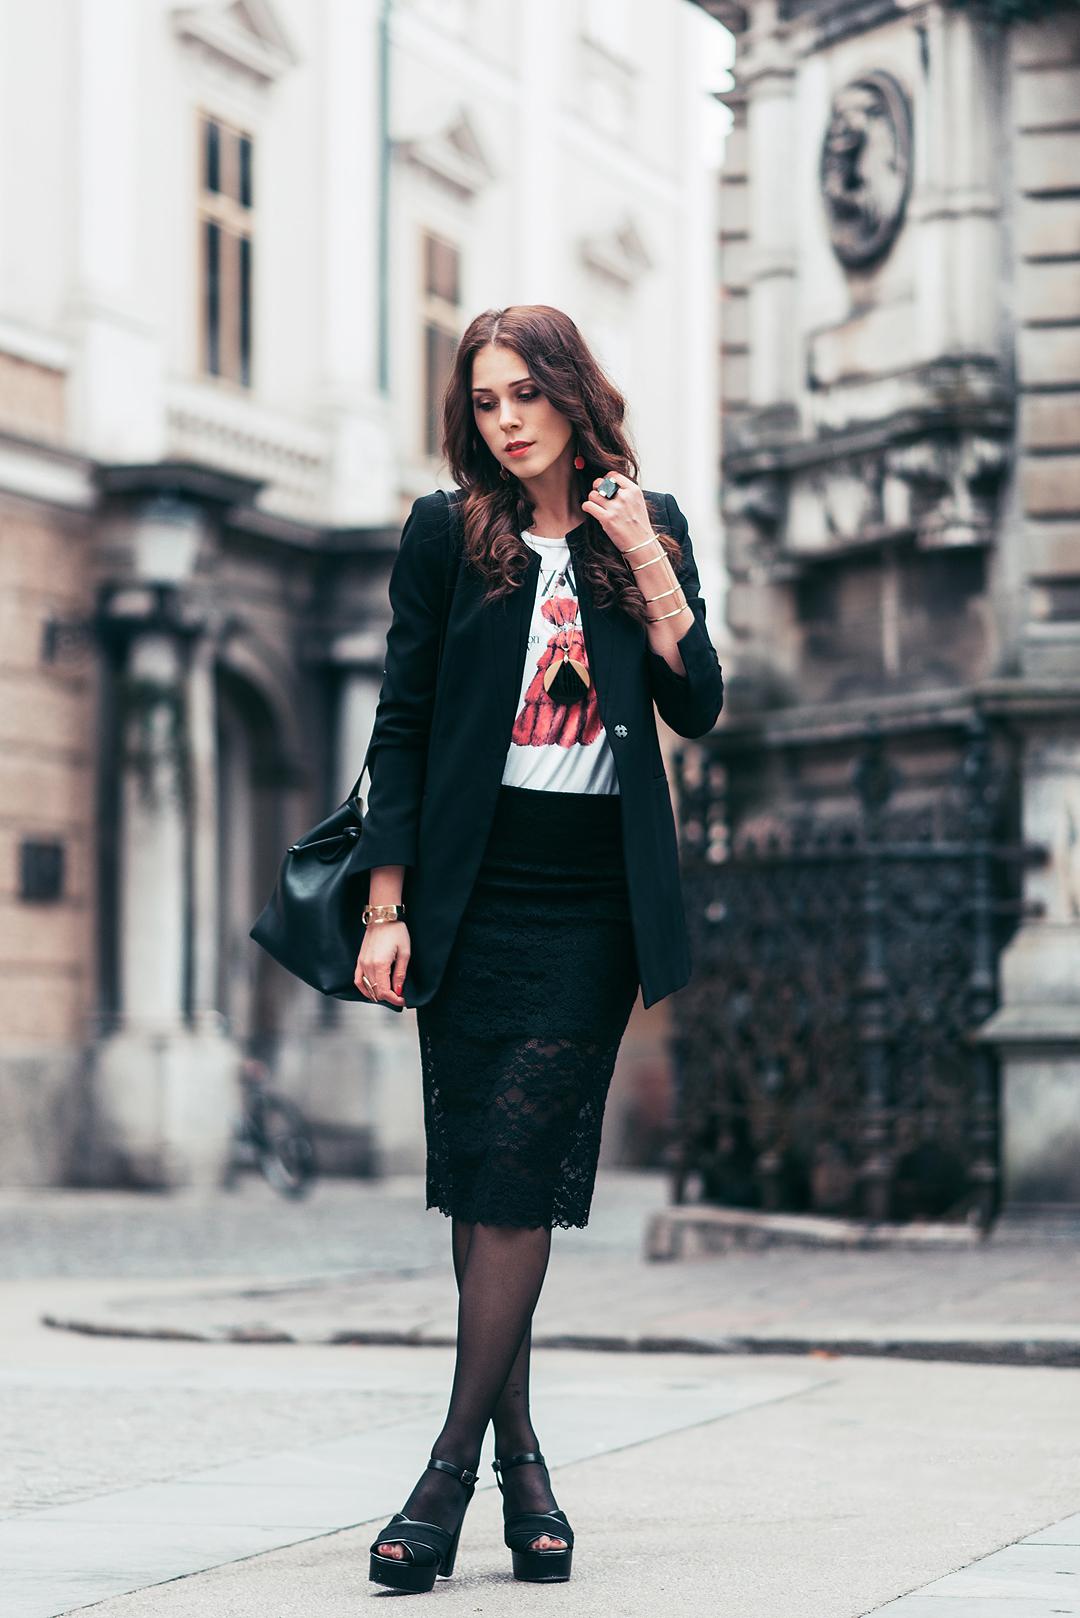 eva-ahacevcic_love-eva_ootd_six-accessories_zara-skirt_blazer_parfois-shoes_style_fashion